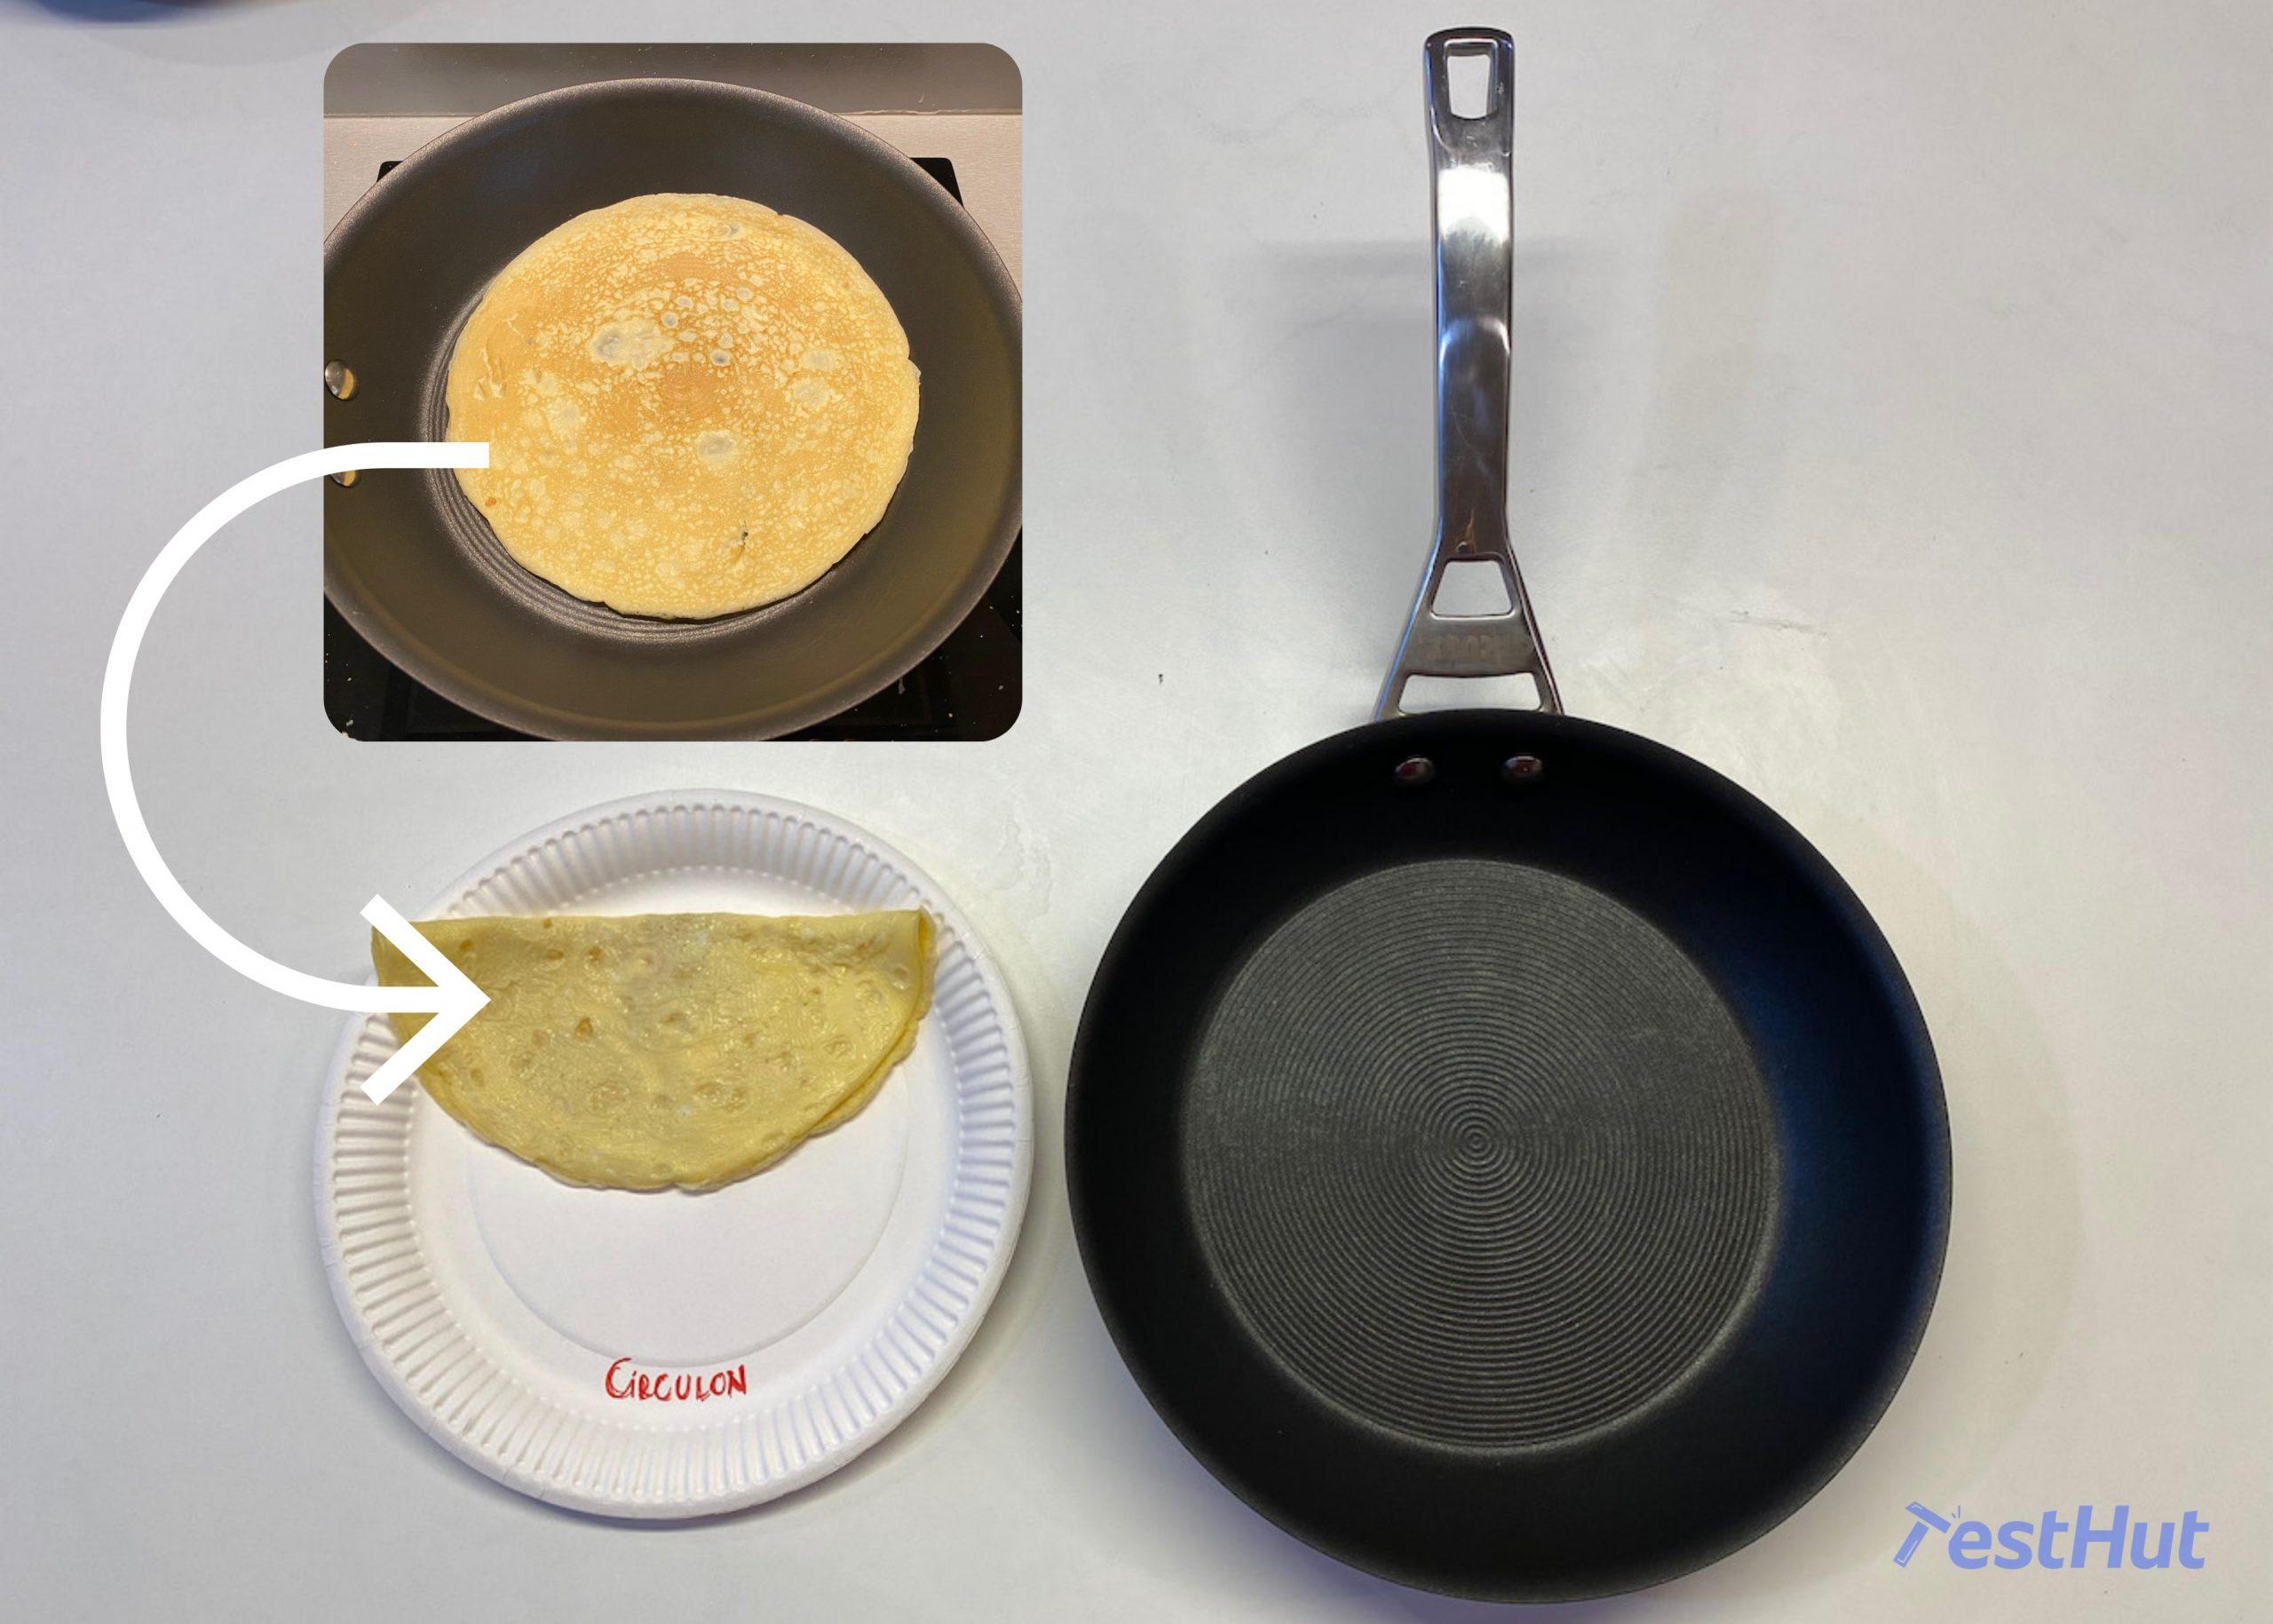 Circulon Infinite French Skillet omelet test